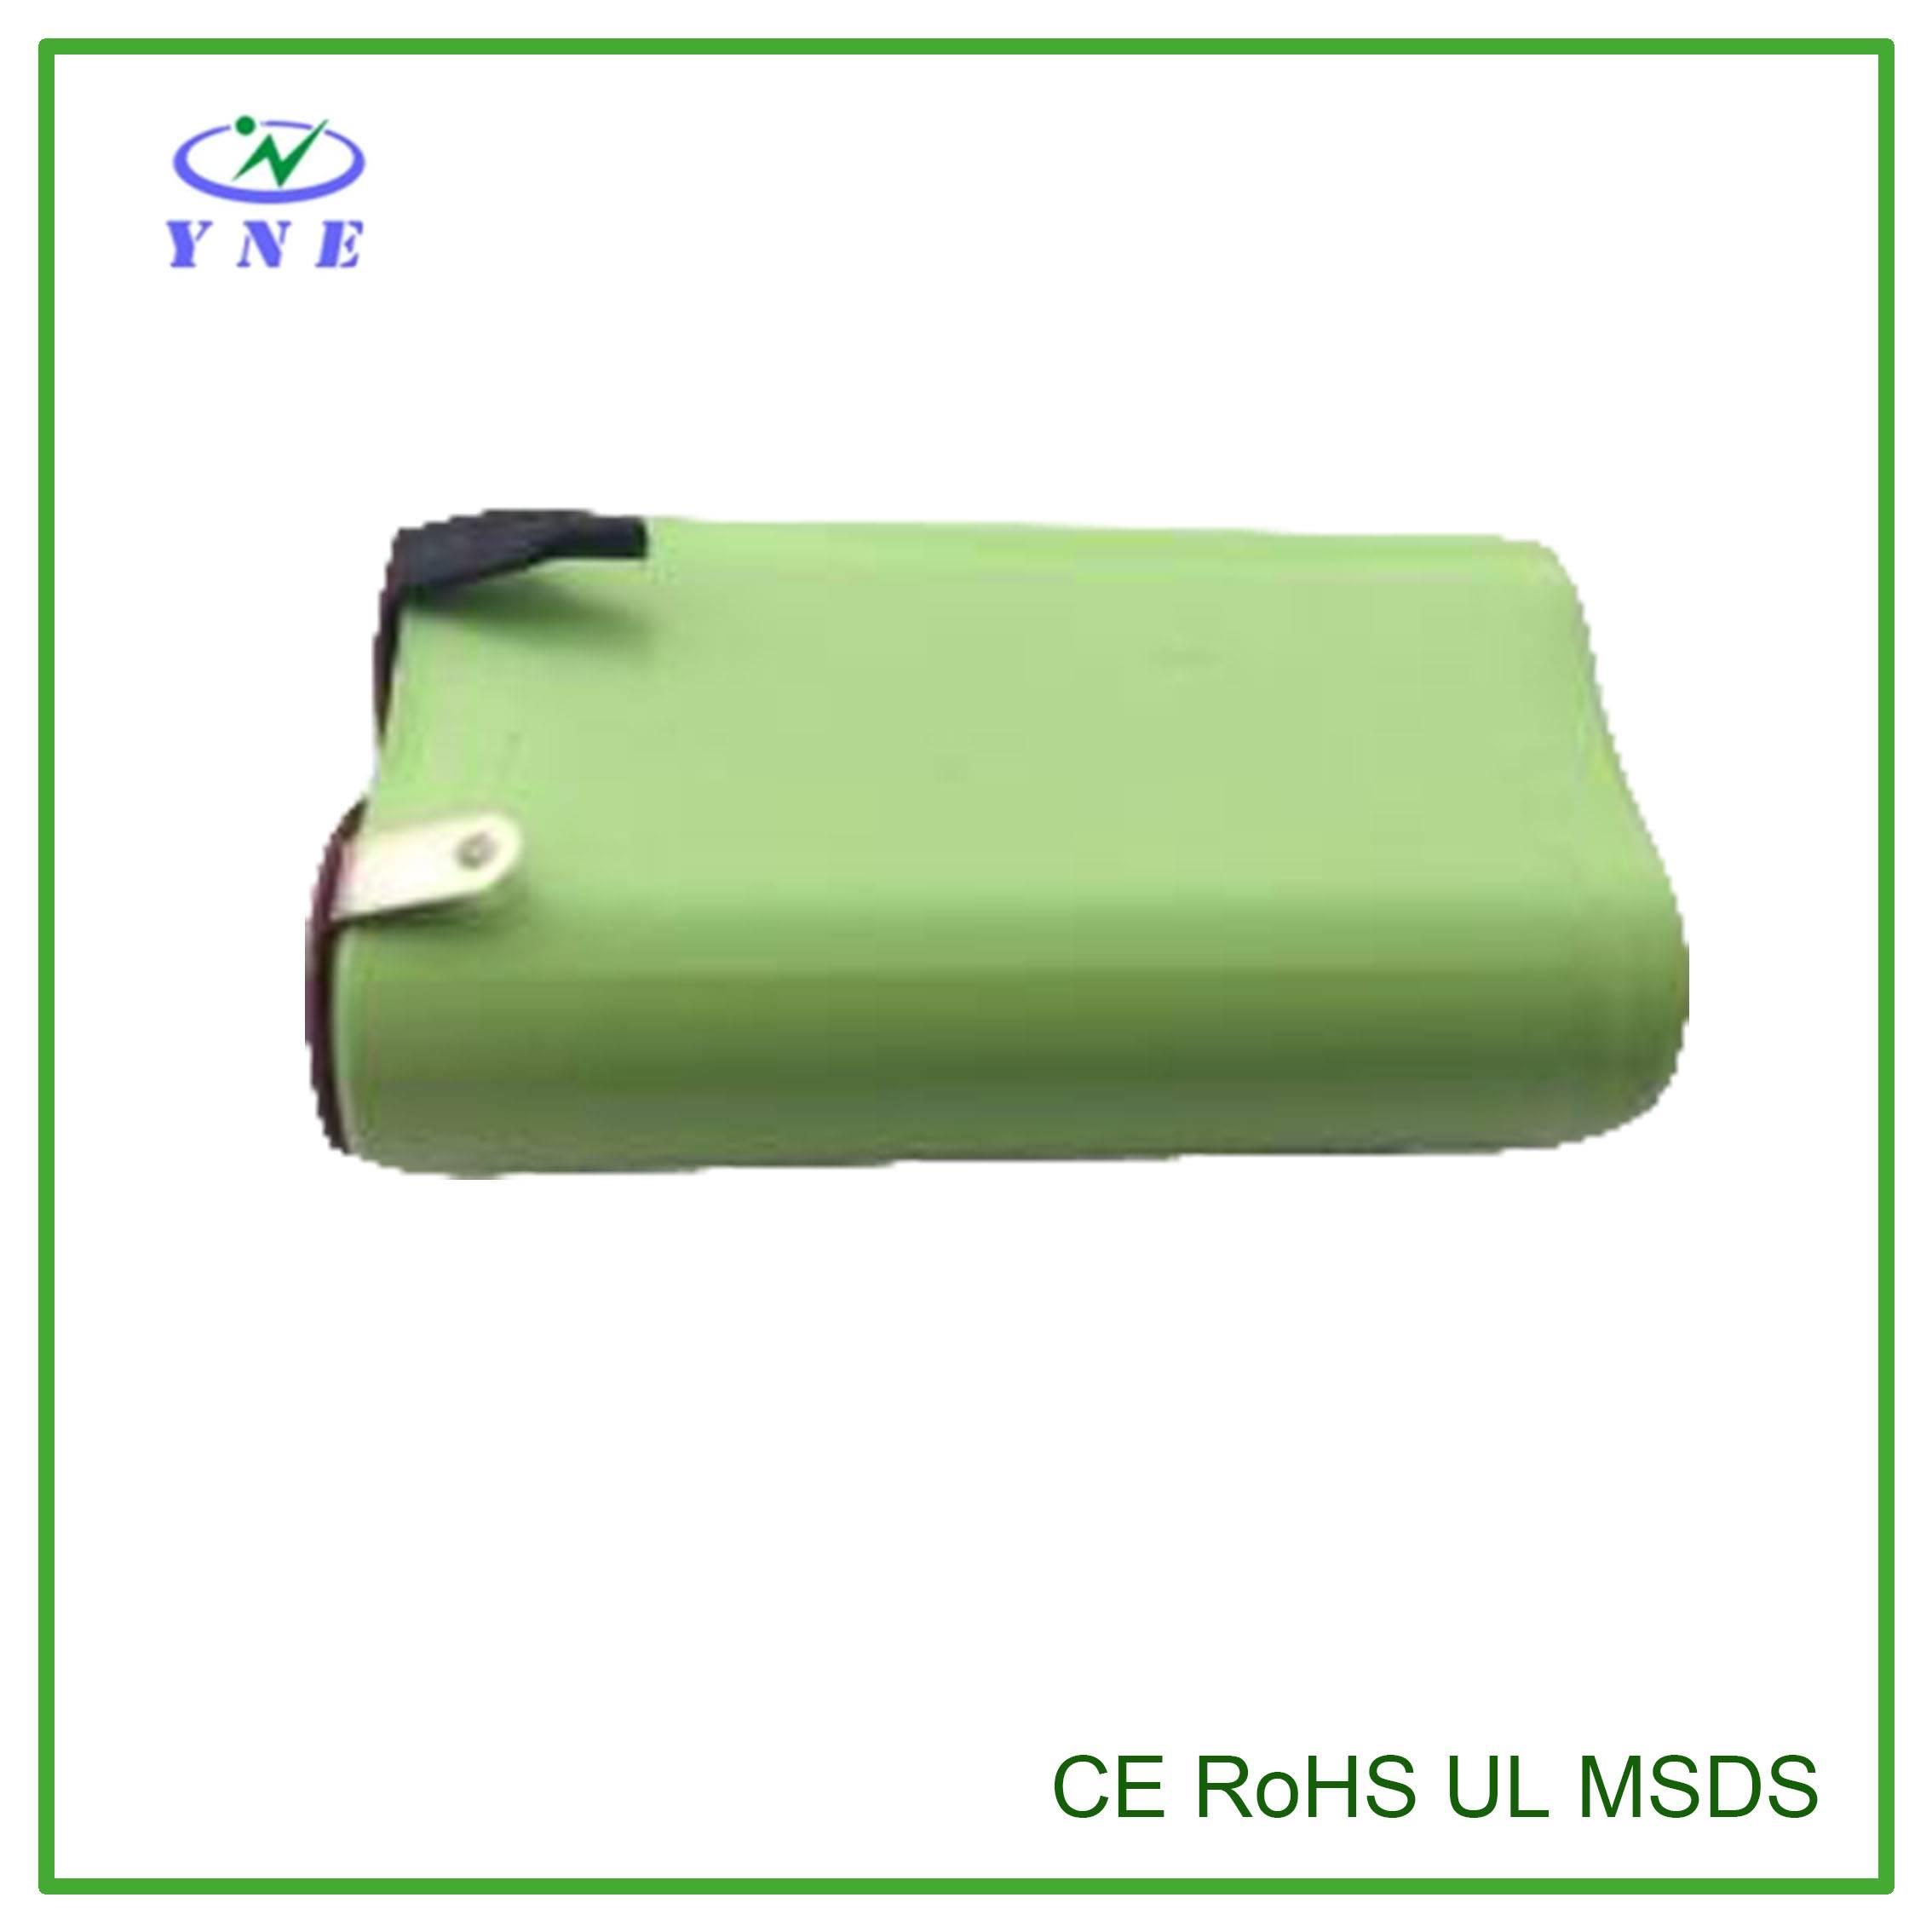 AA 2.4V 800mah Ni-MH Rechargeable Battery